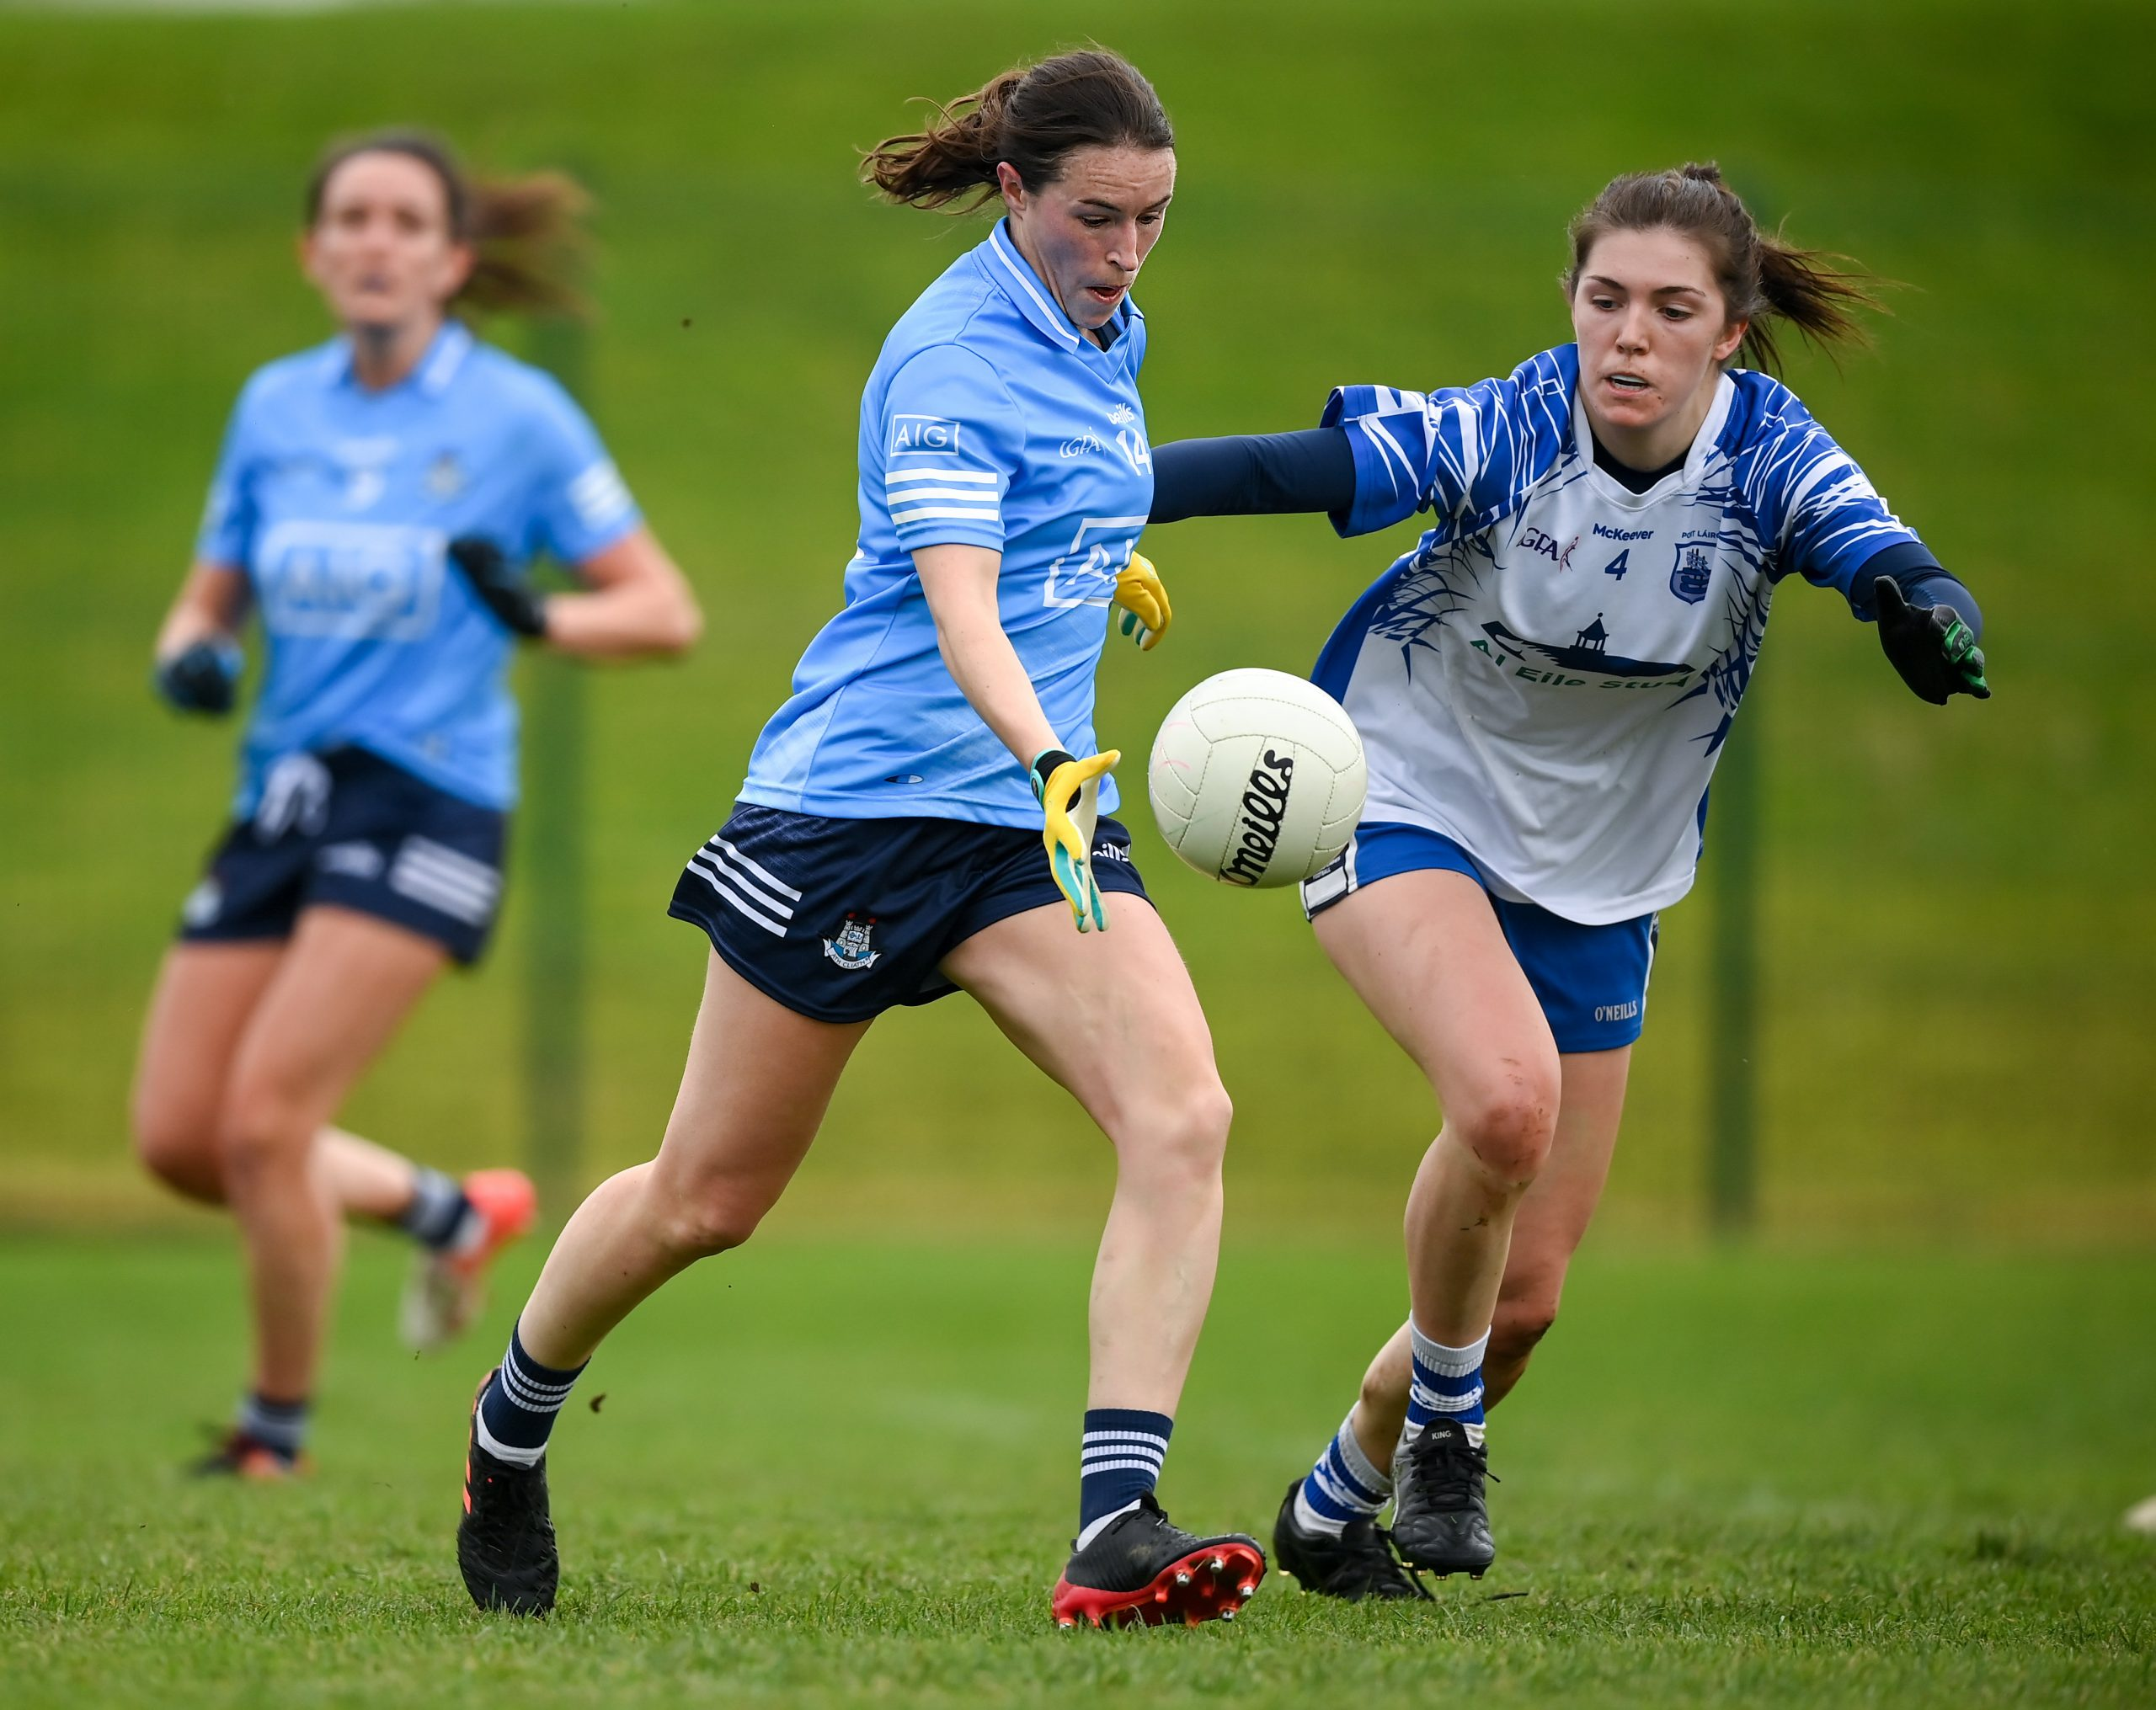 TG4 All-Ireland Senior Ladies Football Championship – Dublin 0-17 Waterford 1-10